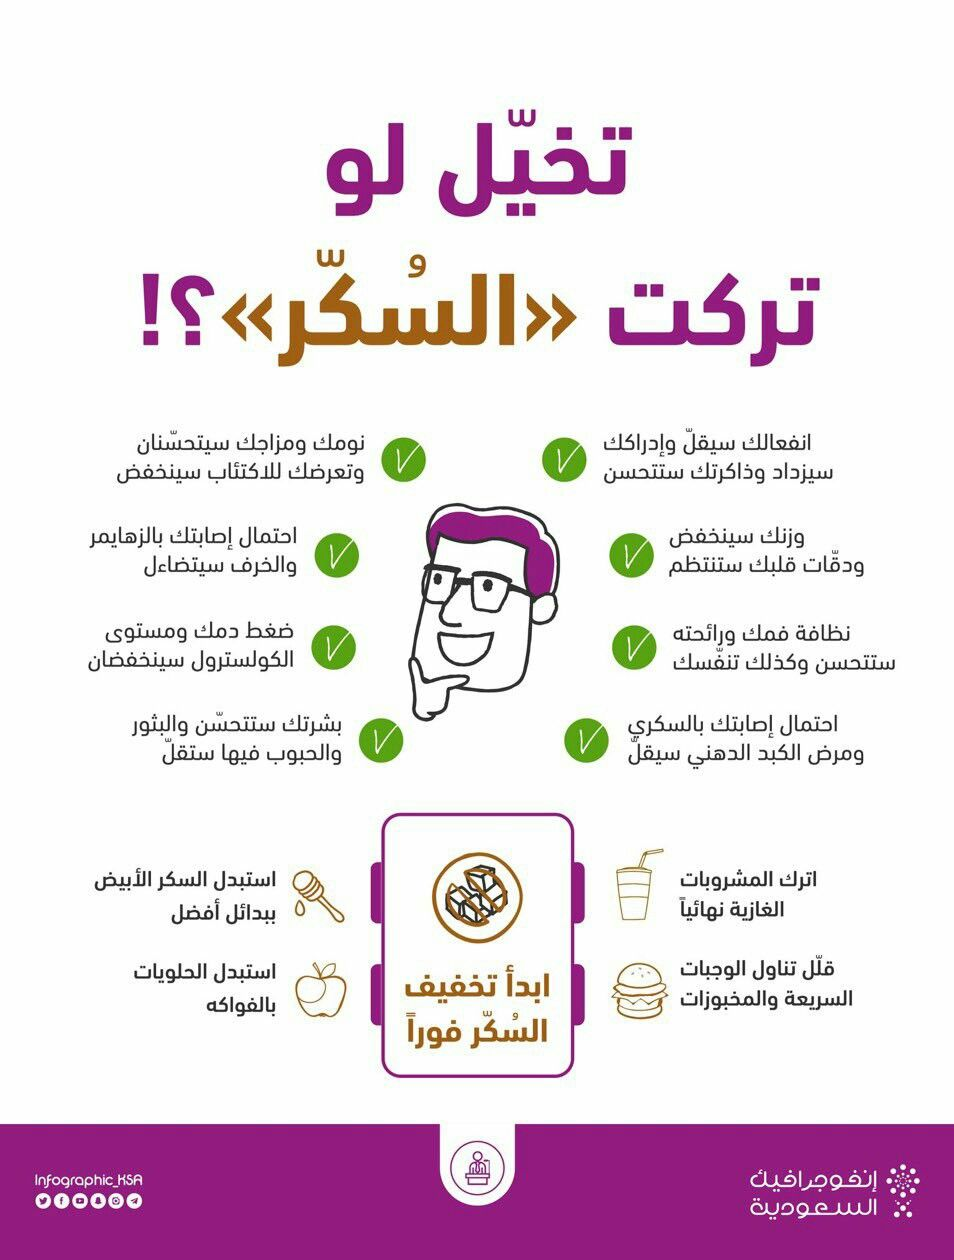 Pin By Samah Alshehri On معلومات عامة Health Fitness Nutrition Health Fitness Food Health Facts